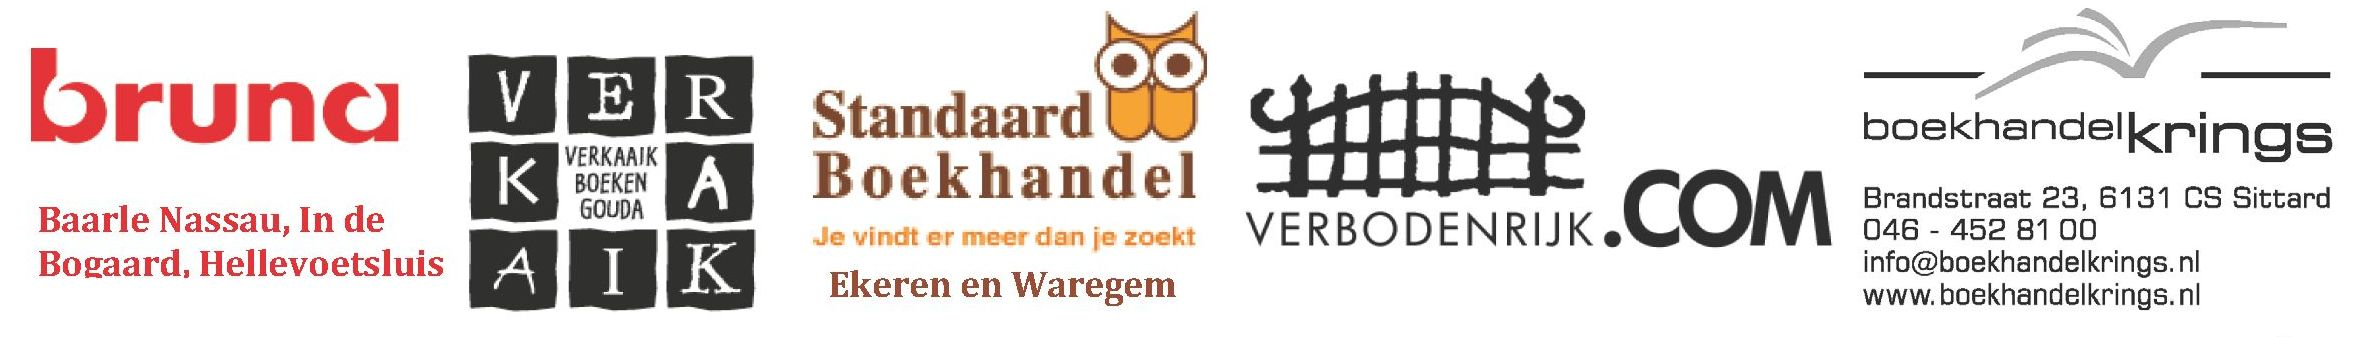 Logo's boekhandels